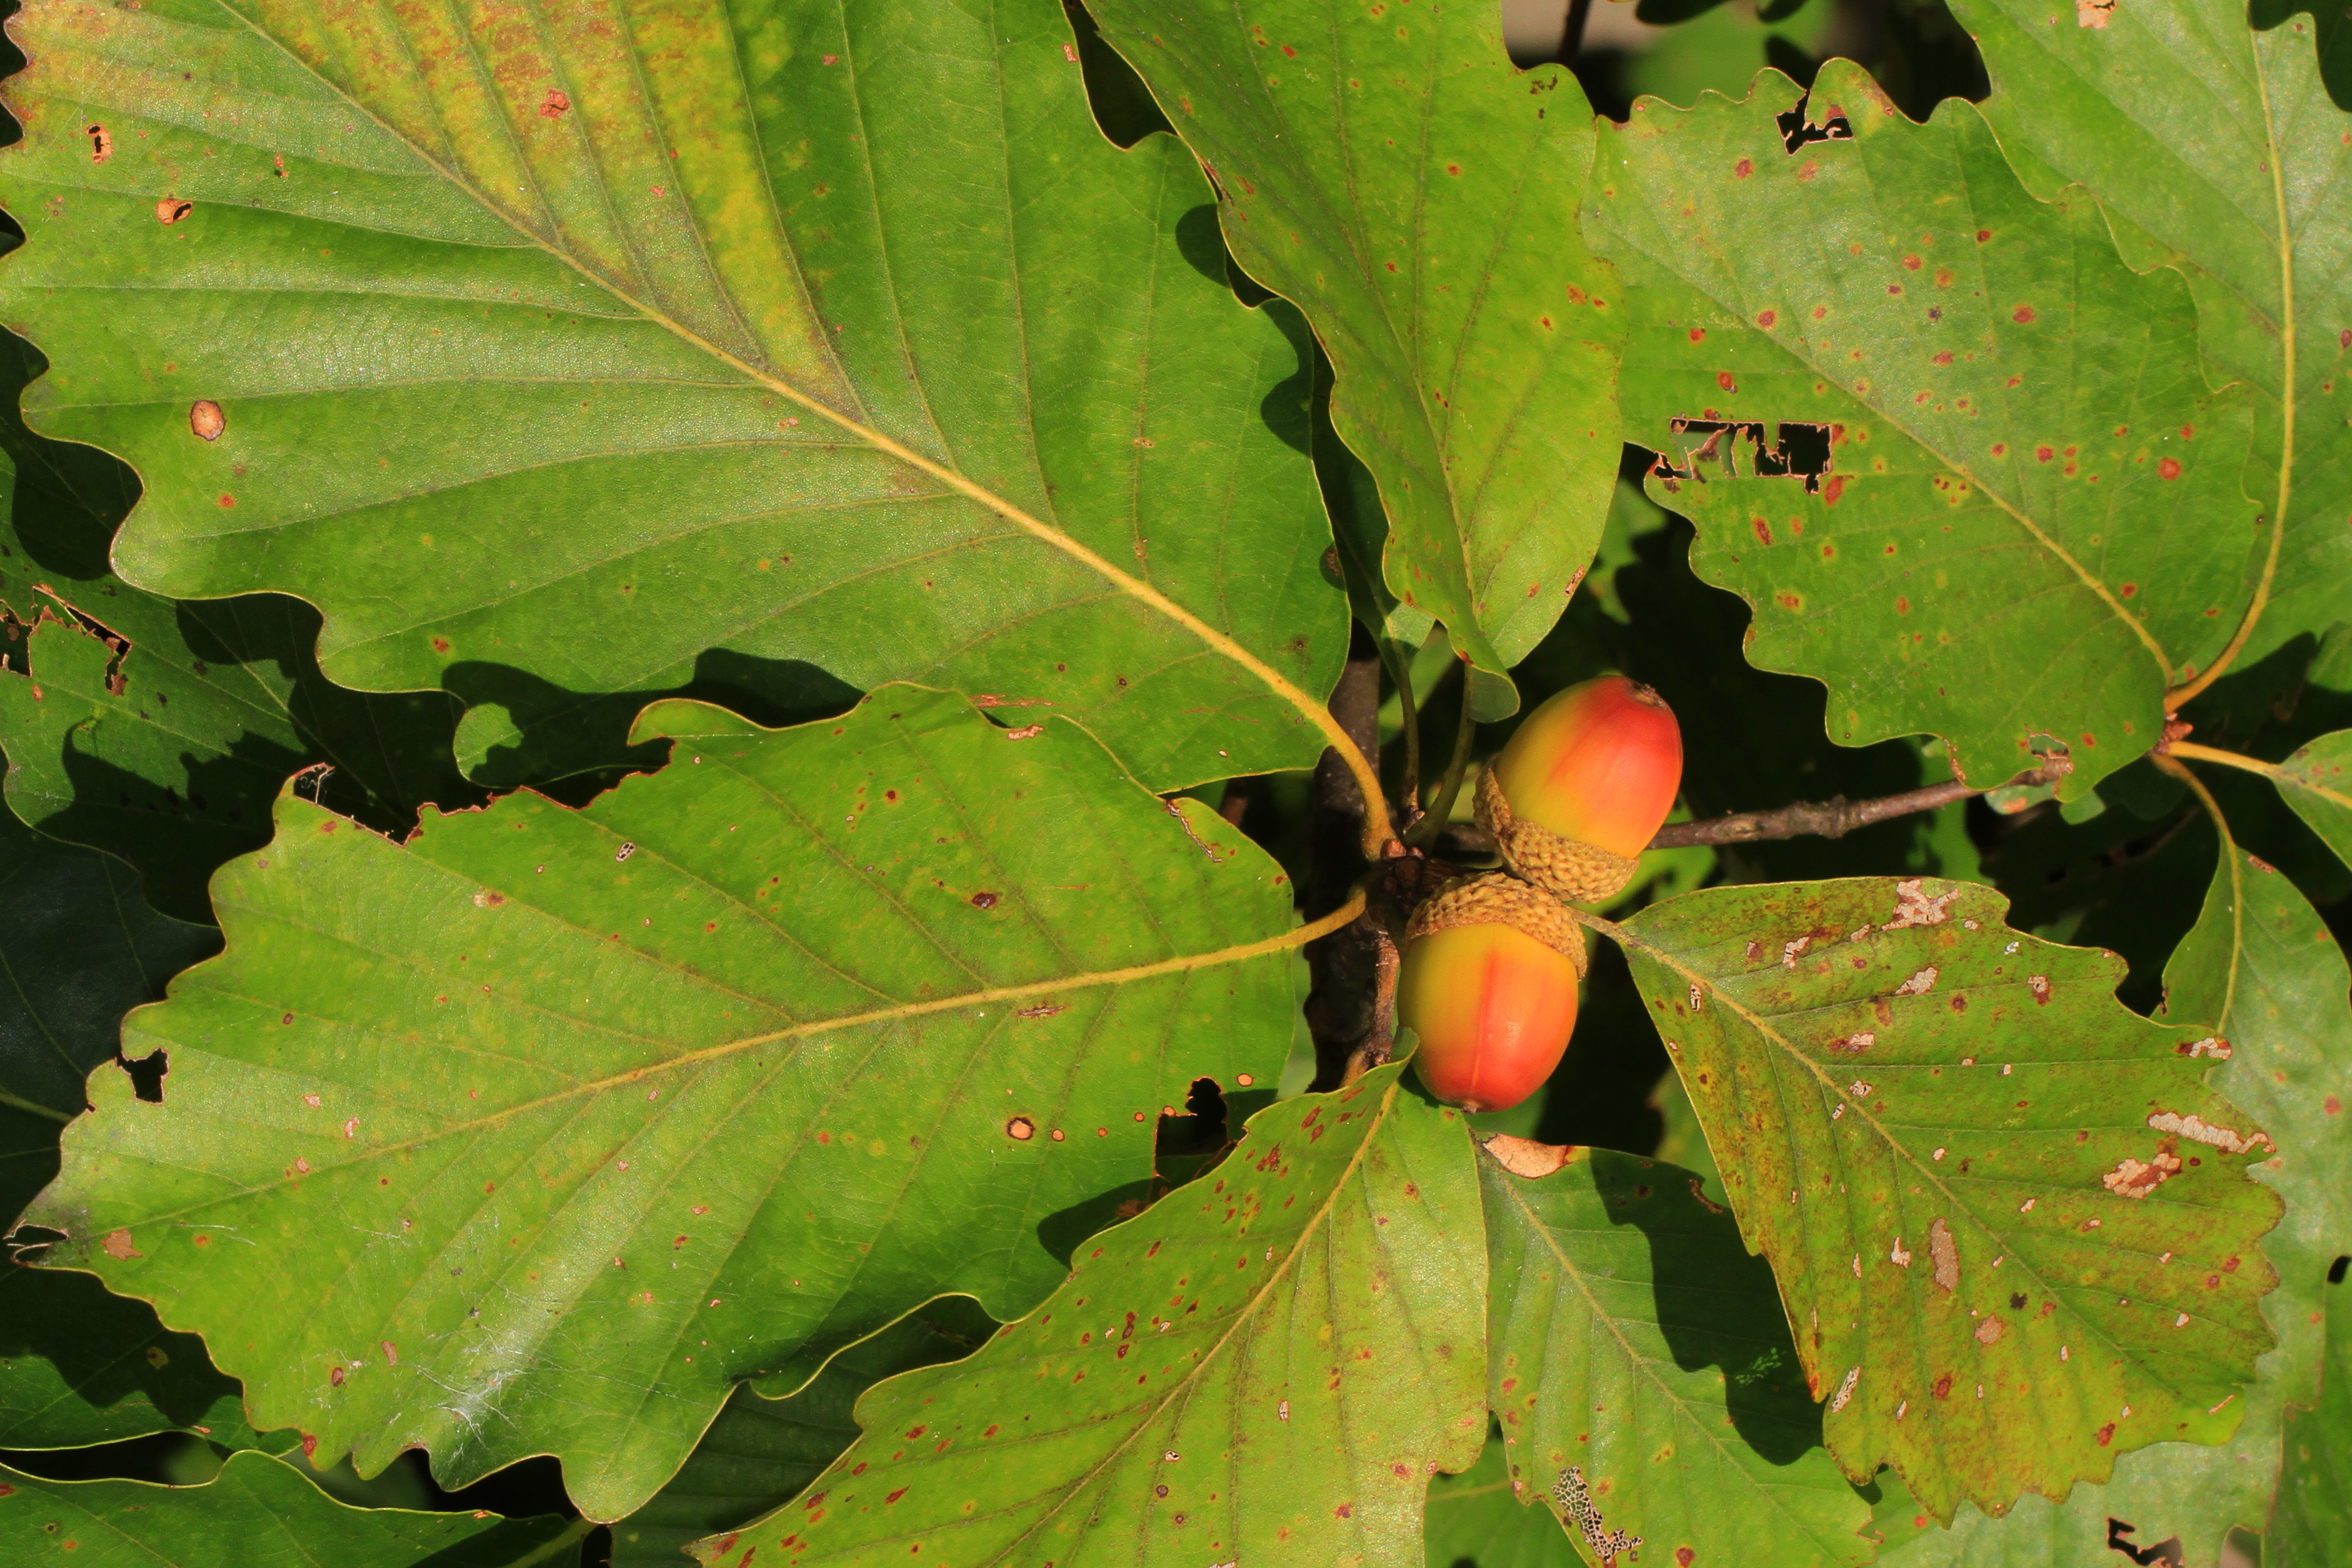 https://upload.wikimedia.org/wikipedia/commons/d/dc/Chestnut_Oak_-_Quercus_montana%2C_Meadowood_Farm_SRMA%2C_Mason_Neck%2C_Virginia.jpg